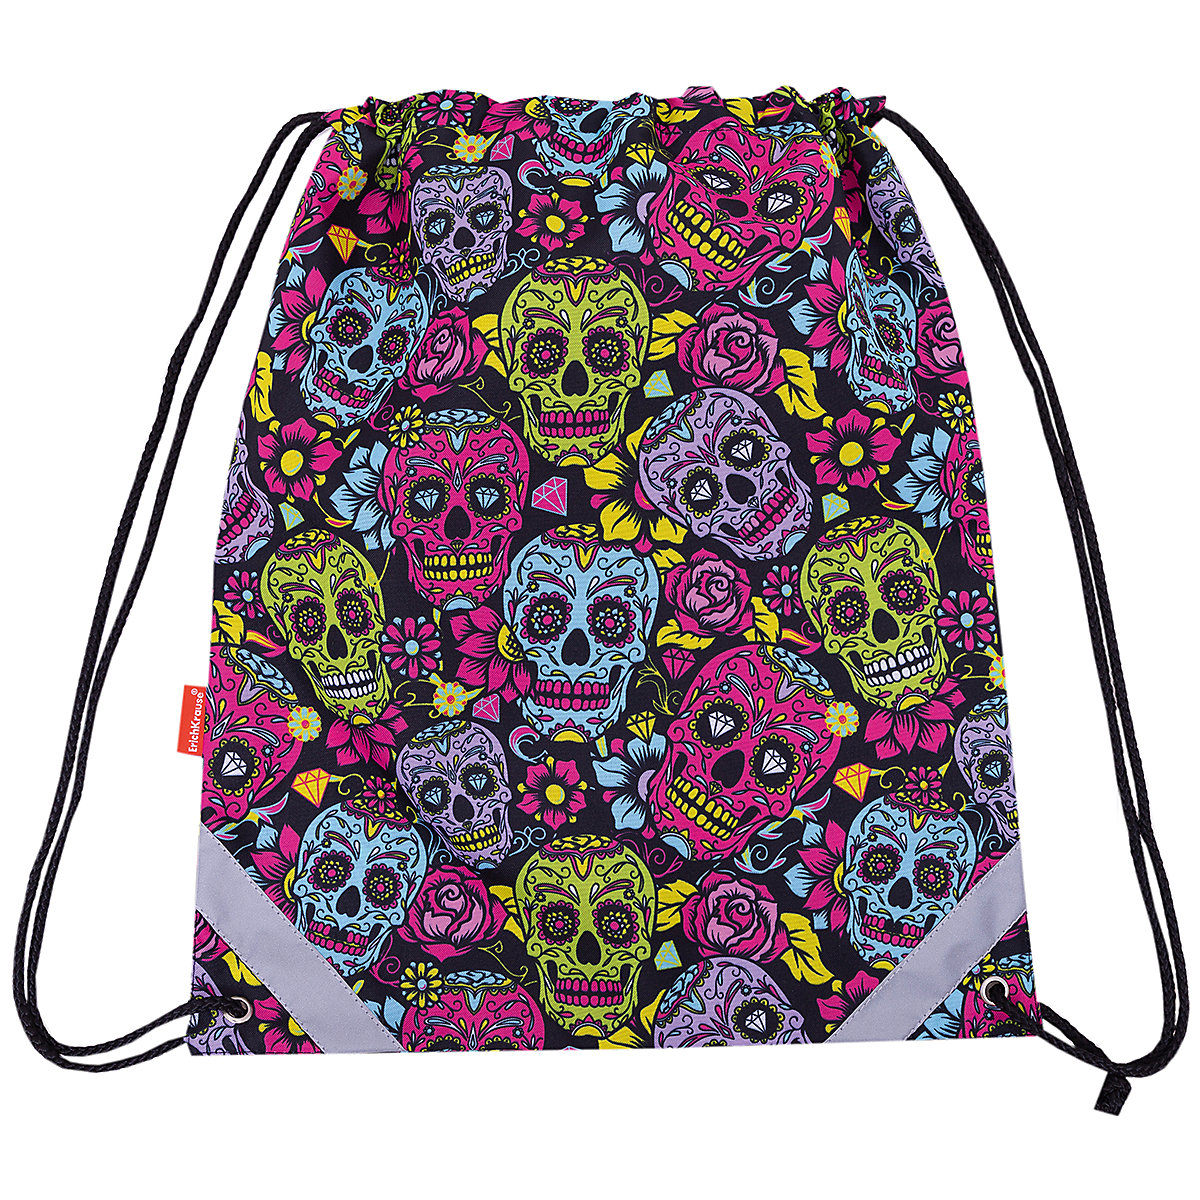 ERICHKRAUSE Drawstring Bags 8348578 Boys Polyester sports backpack shoes bag MTpromo